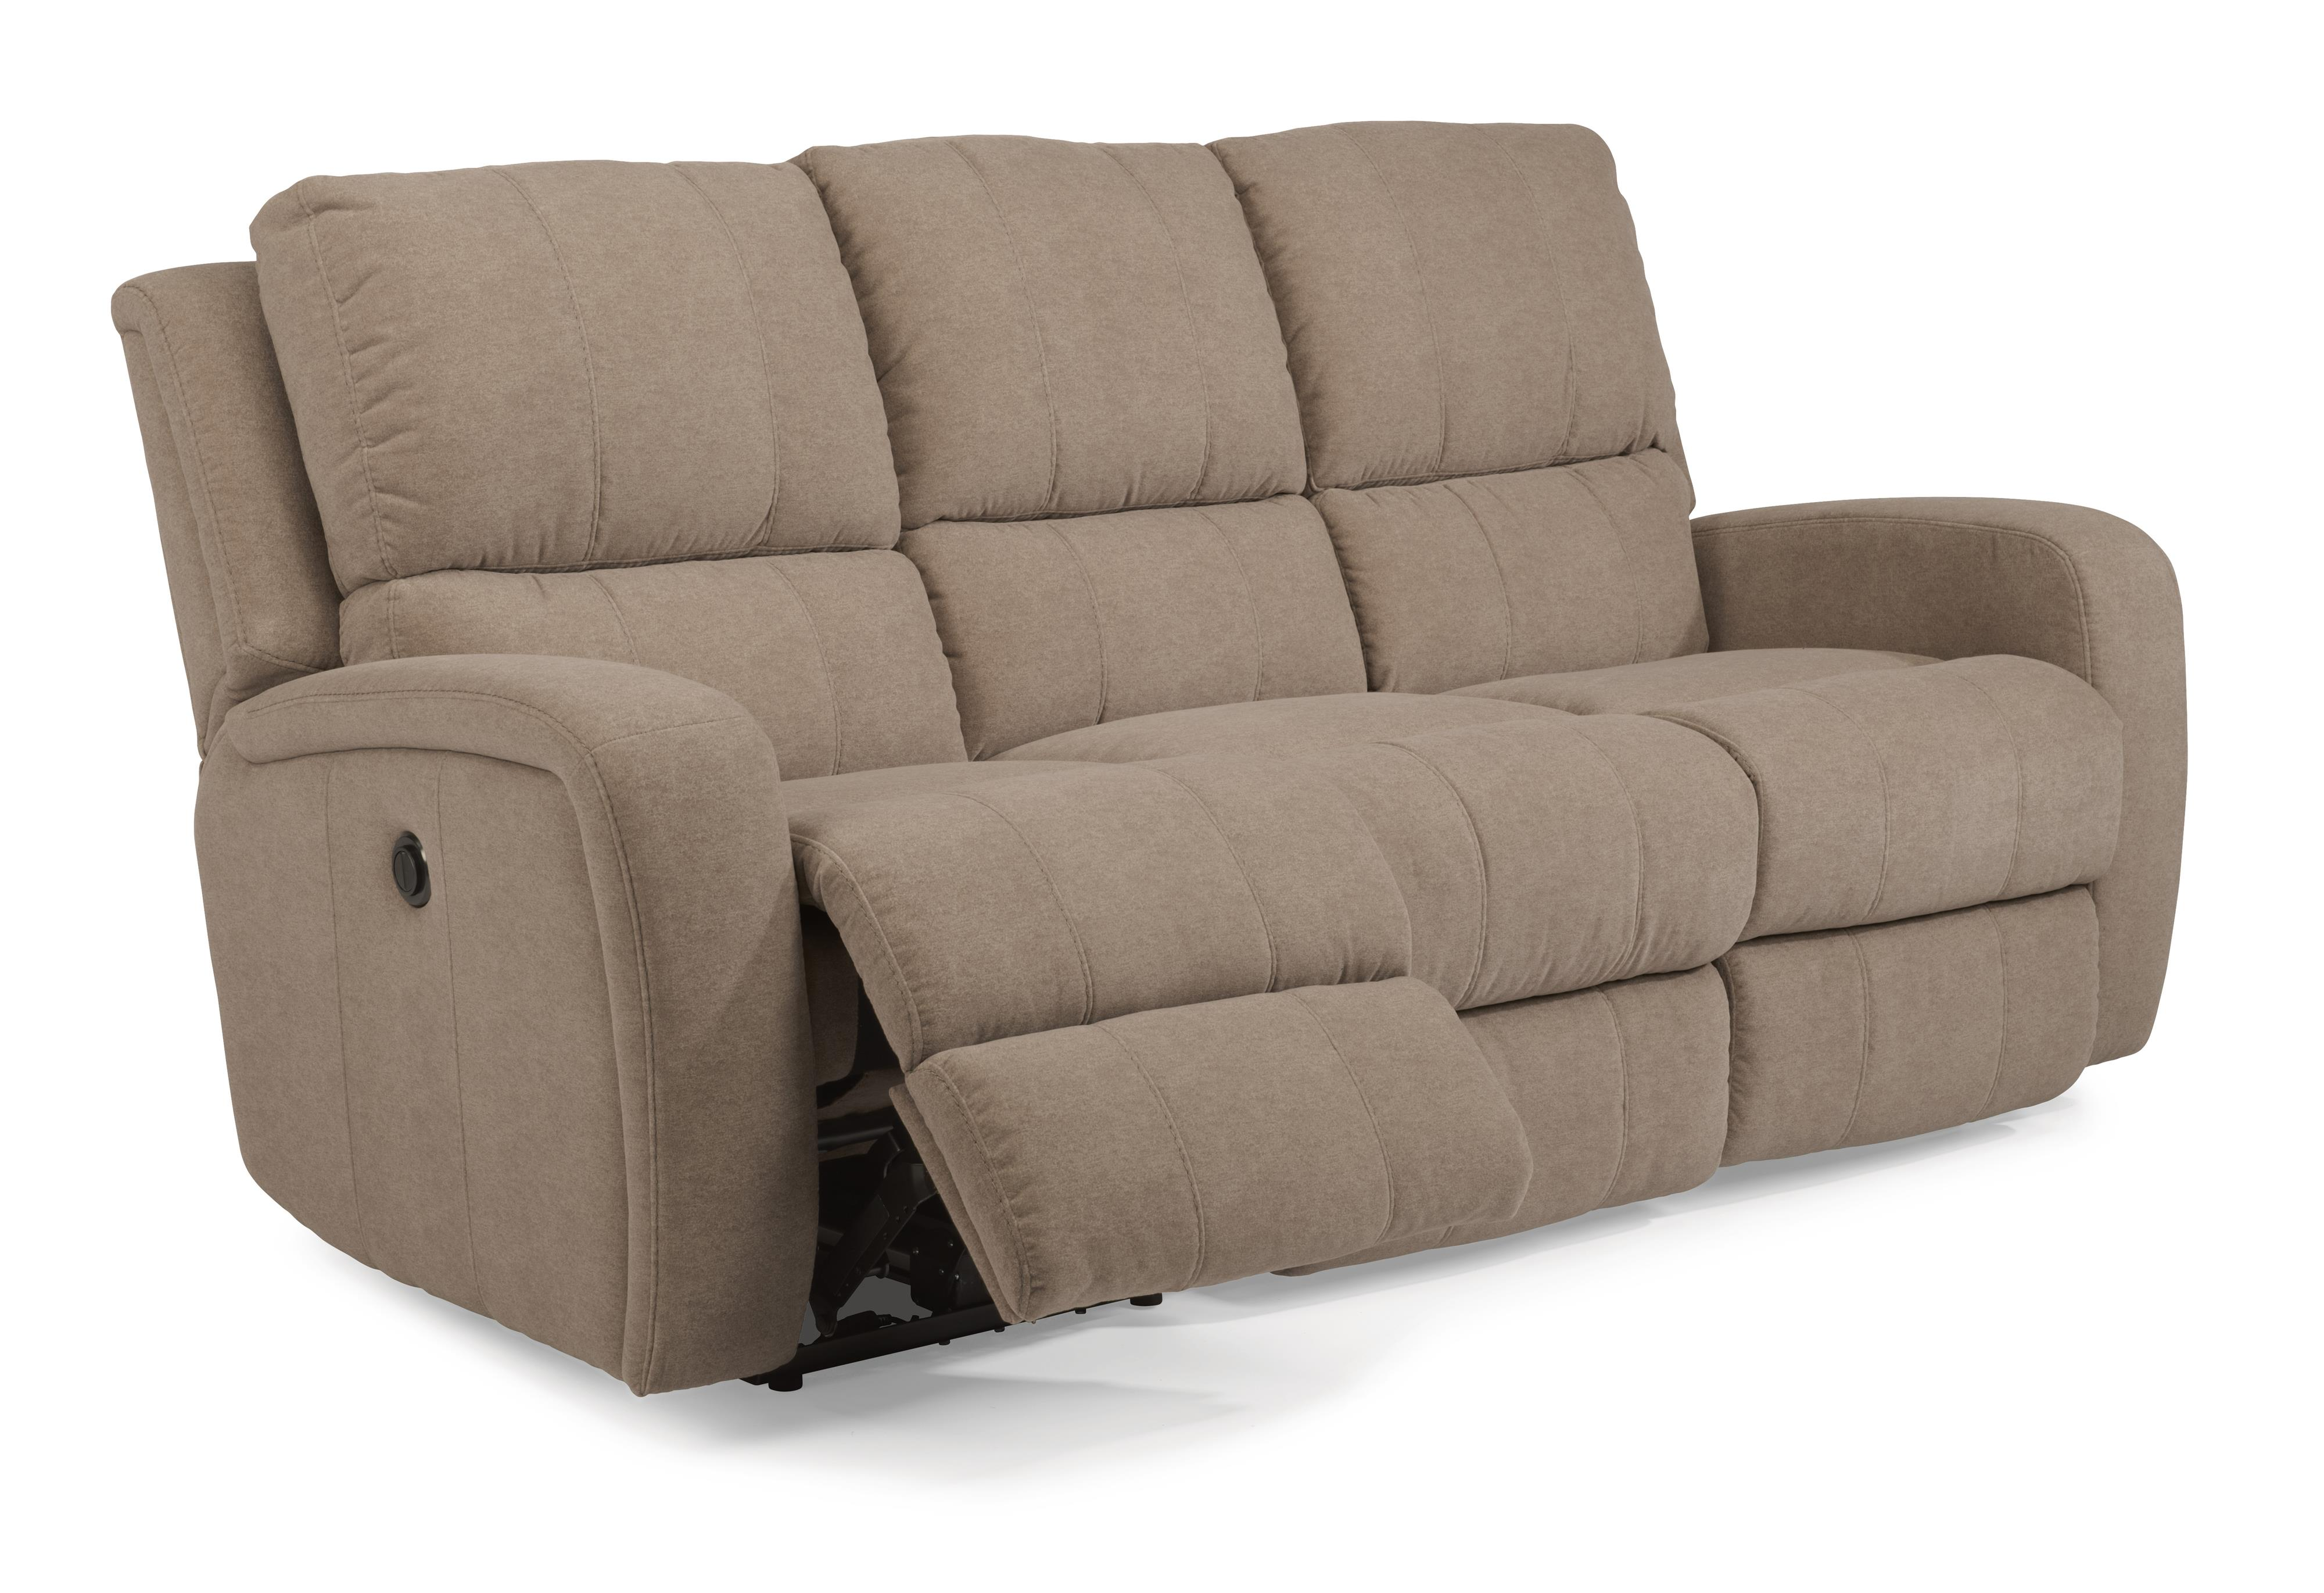 Flexsteel Latitudes-Hammond Double Reclining Sofa w/ Power - Item Number: 1156-62P-023-01